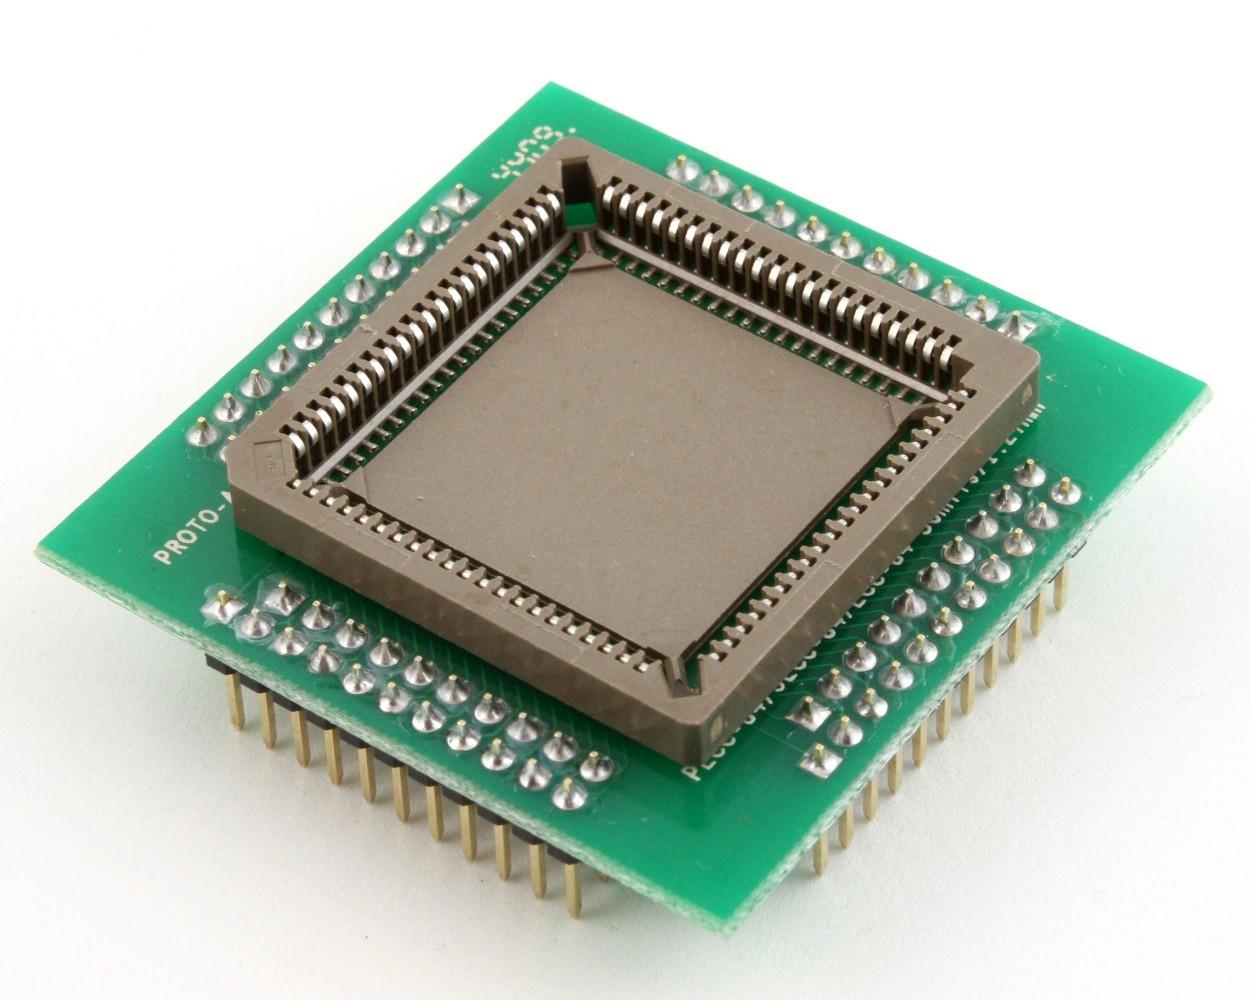 PLCC-84 Socket to PGA-84 Adapter (1.27 mm pitch, 30 x 30 mm body 0